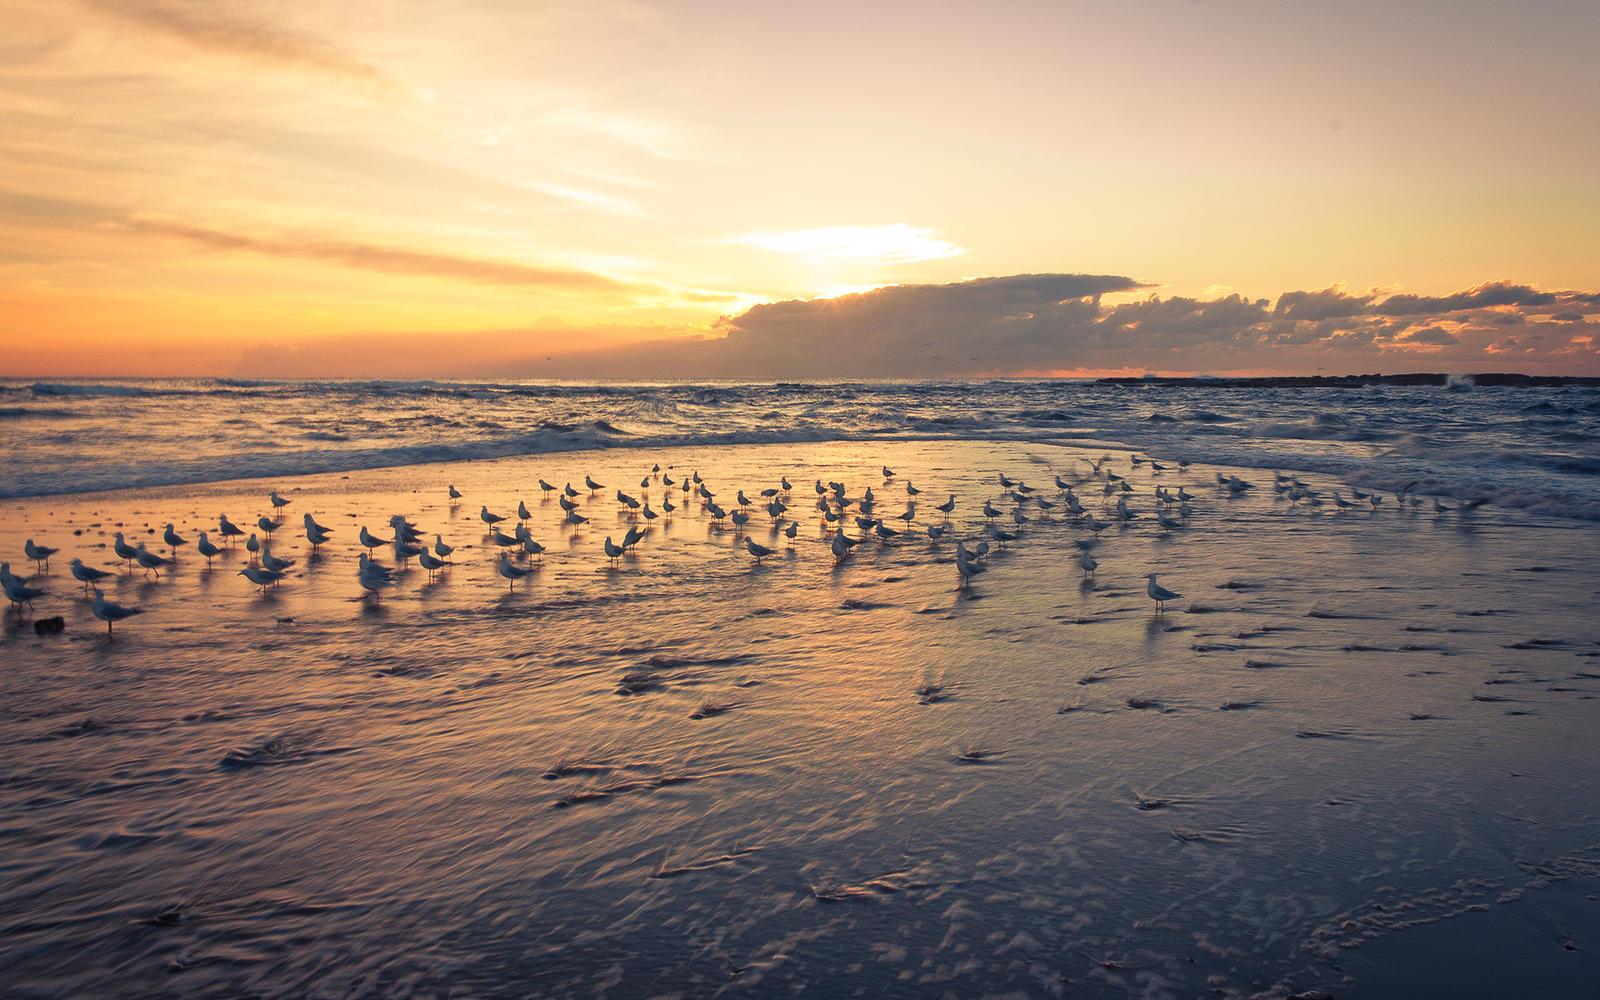 Seagulls on Longreef Beach by SxyfrG